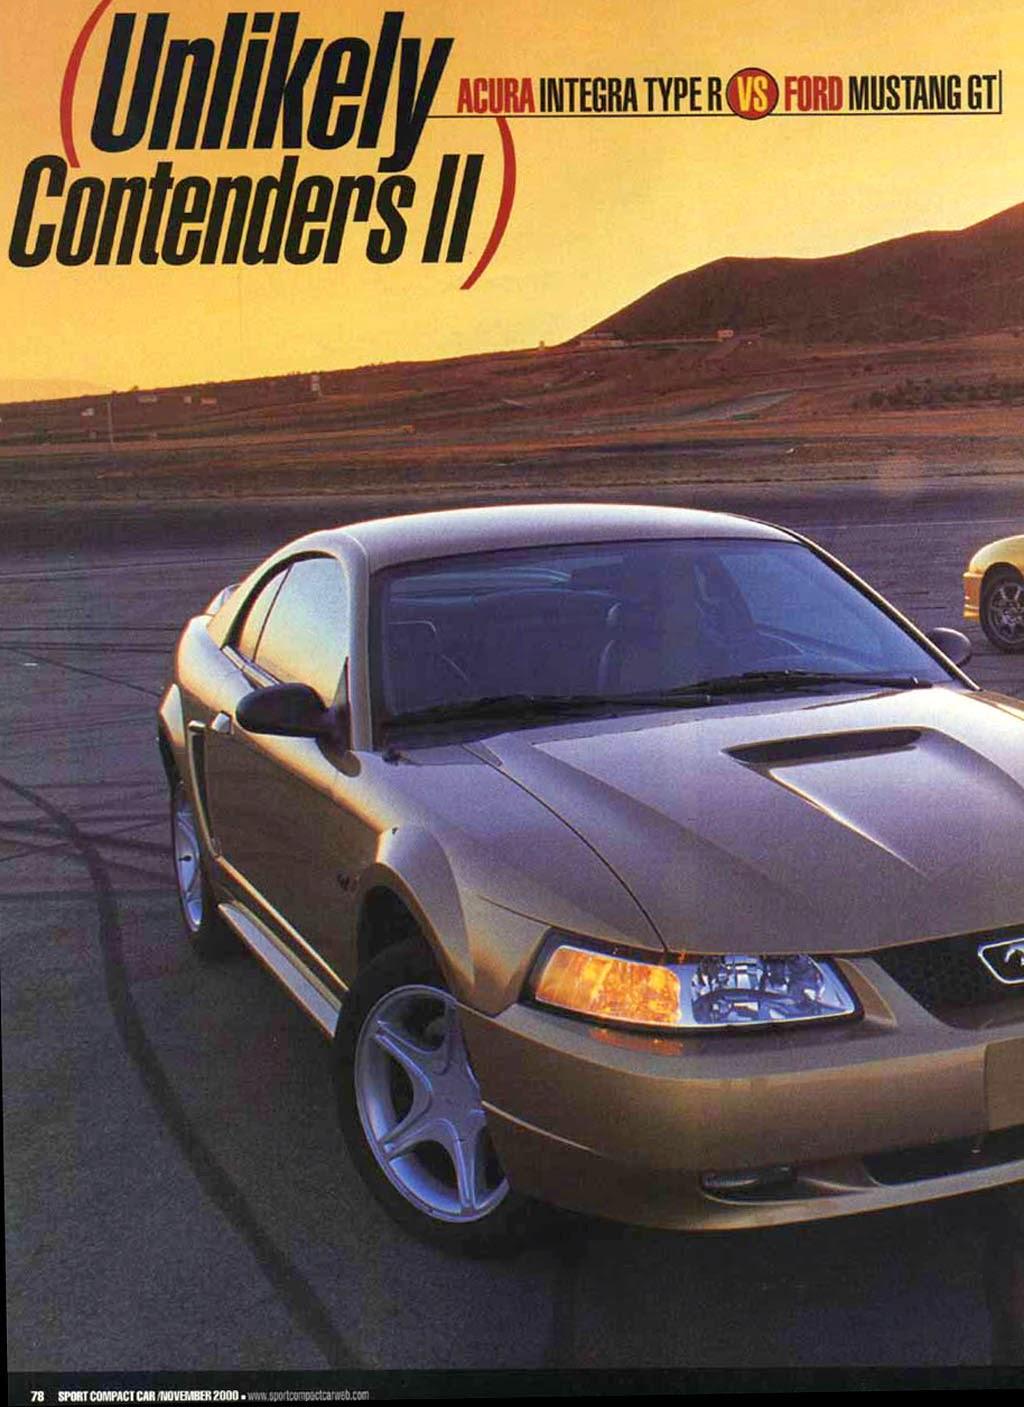 Integra Type R #1920 Project blog: (Sport Compact Car, November 2000) Acura Integra Type R vs ...